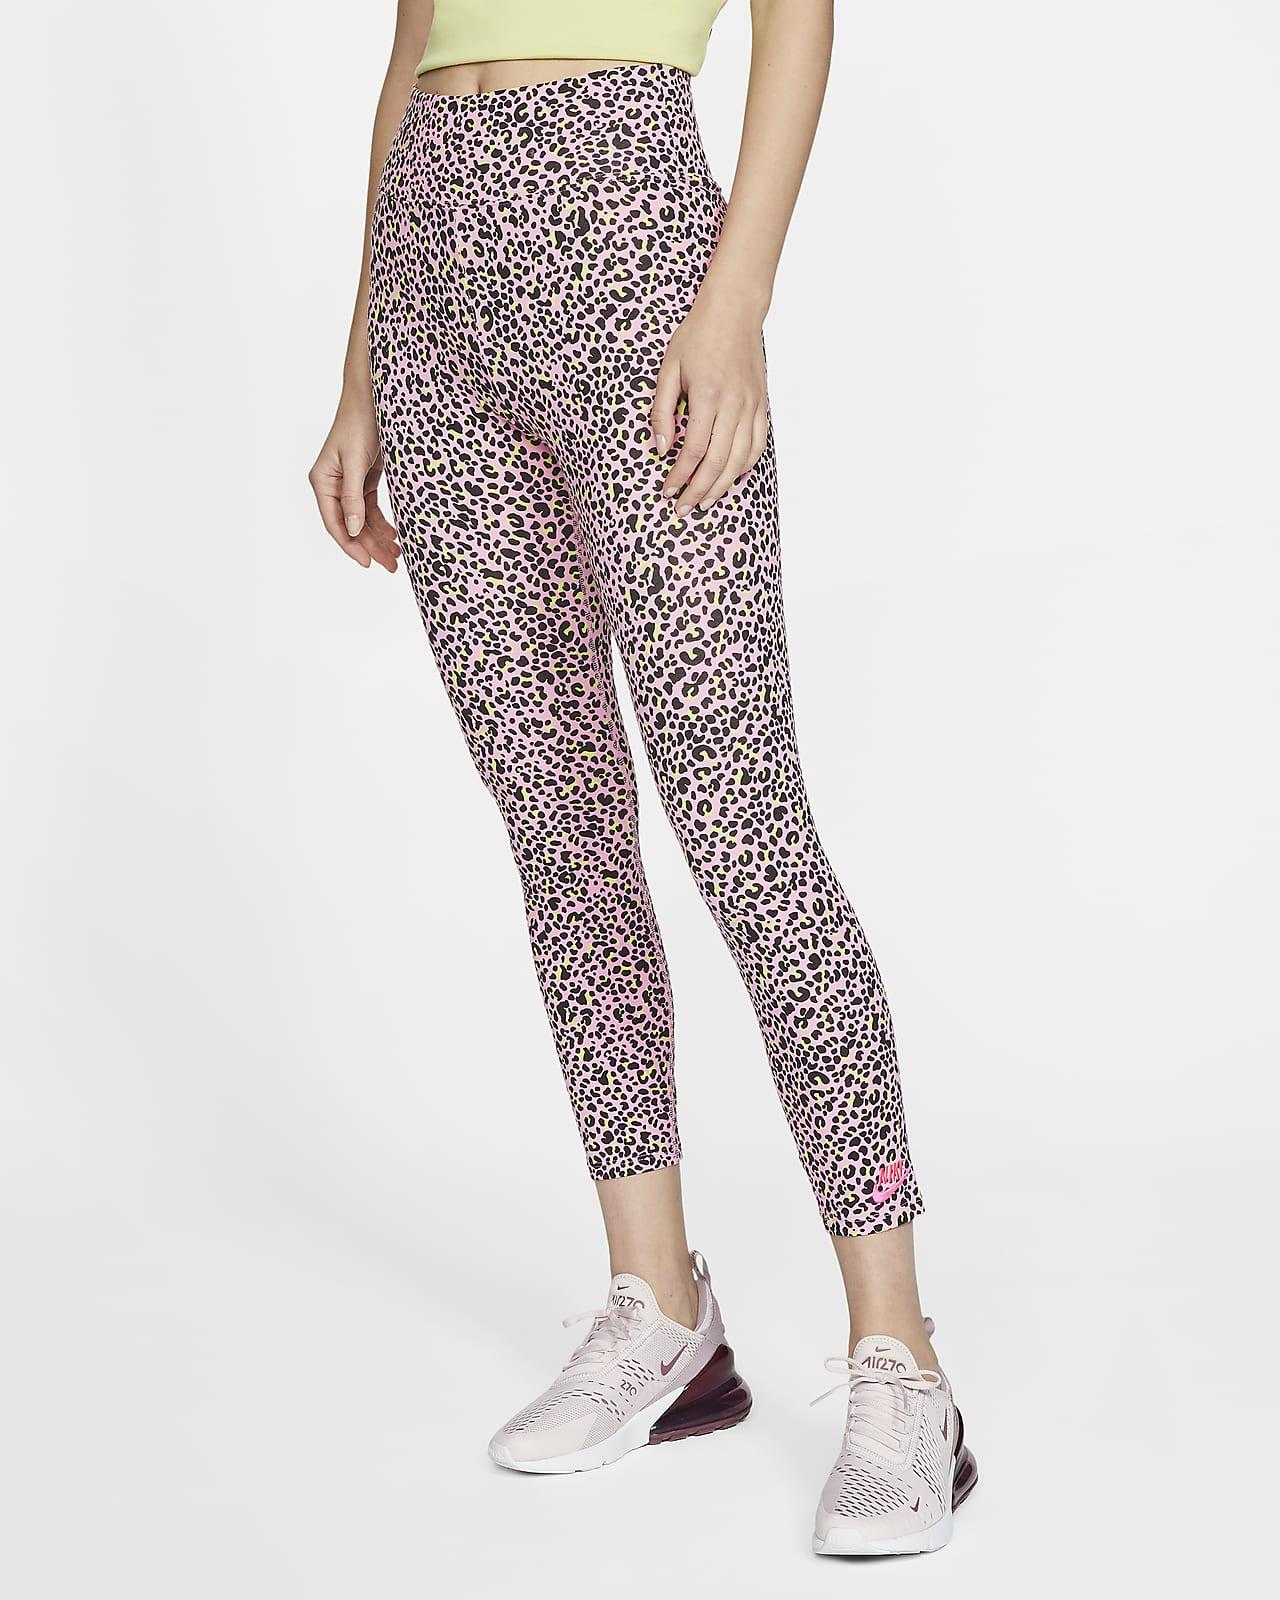 Nike Sportswear Women's High-Waisted Animal Print Leggings